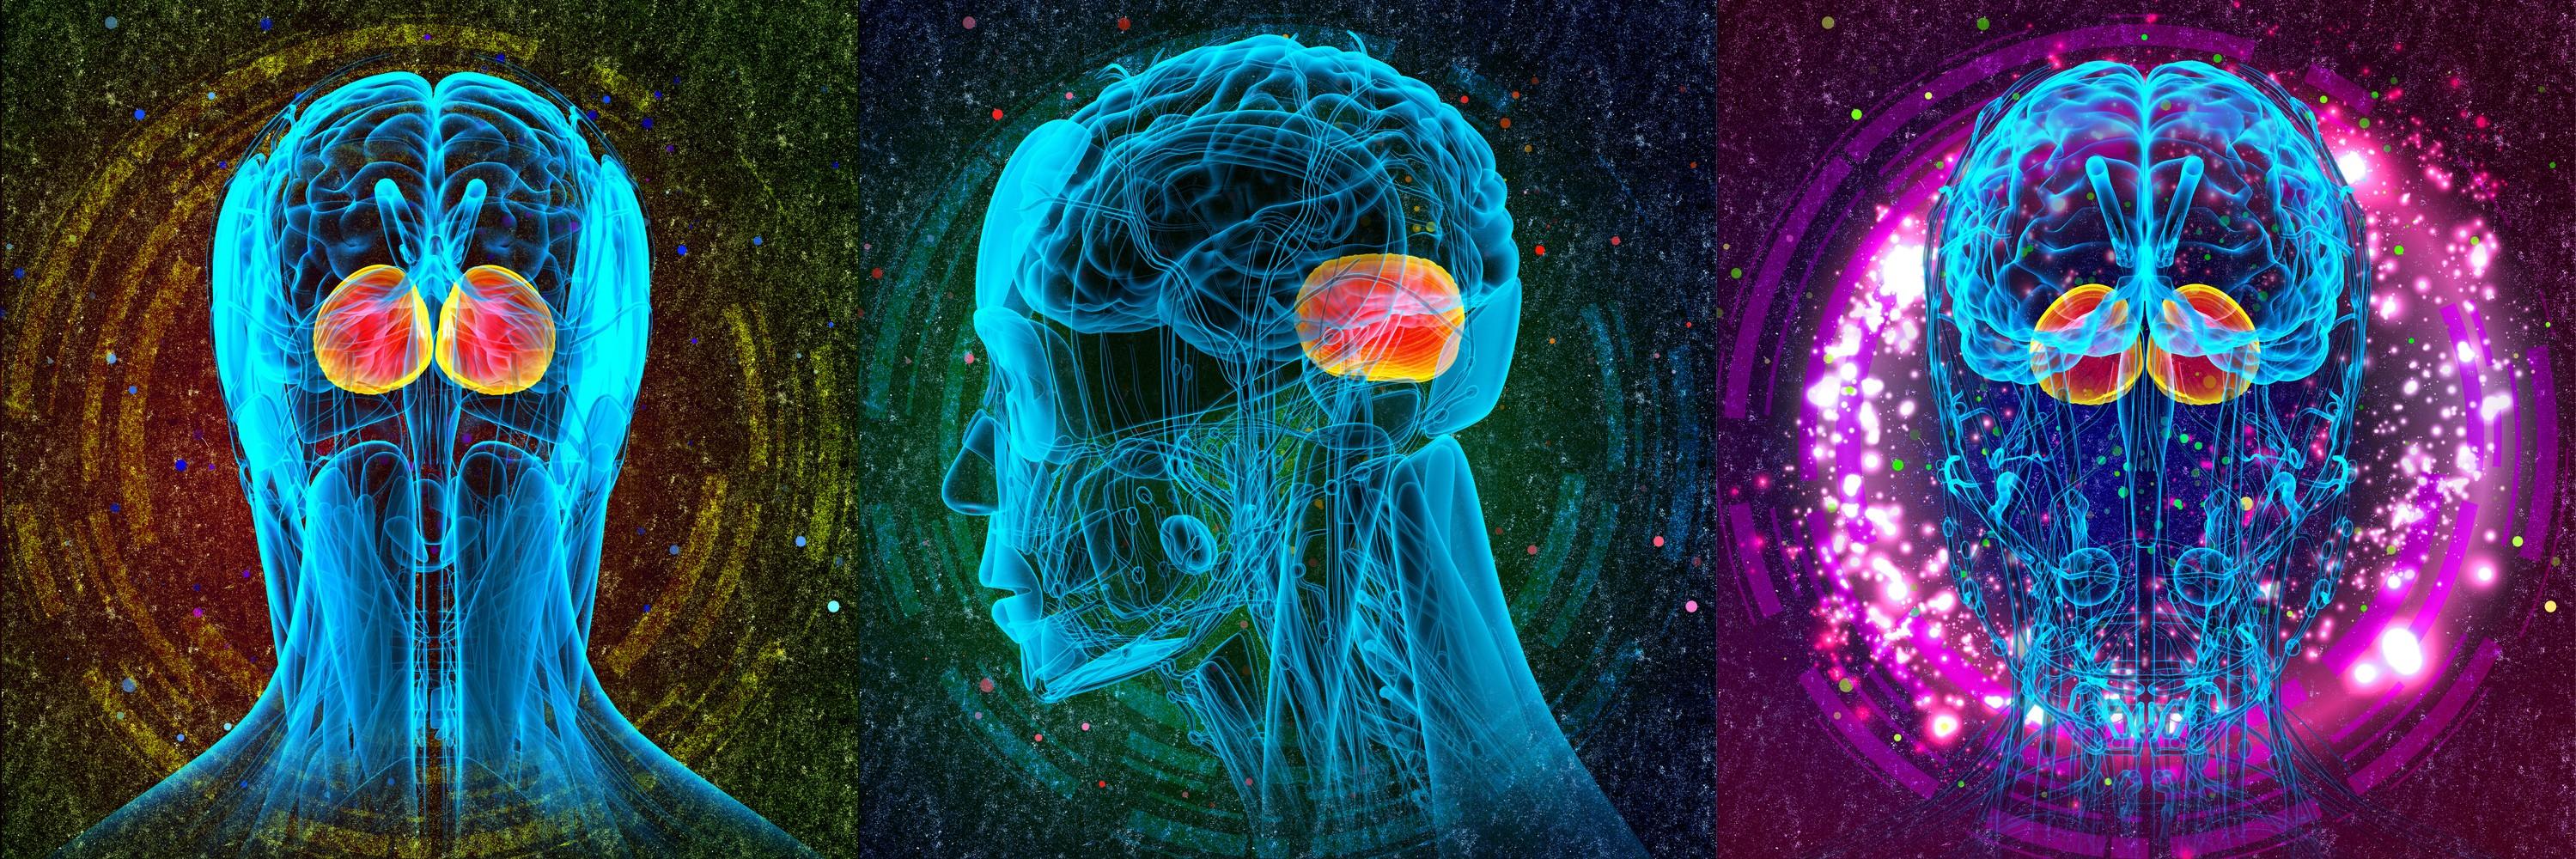 Amygdala portion of human brain